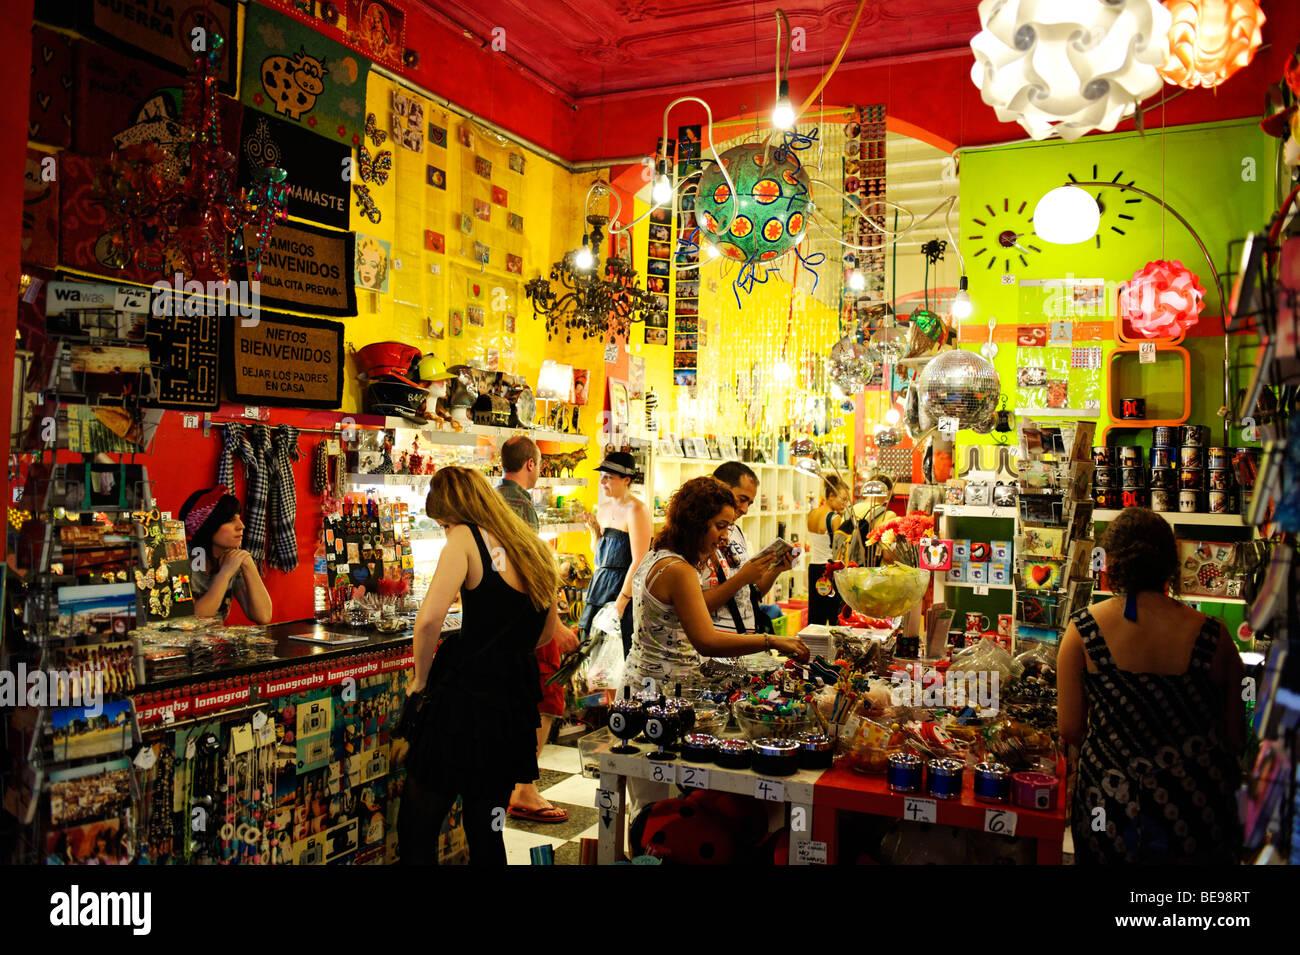 Hip boutique store selling memorabilia, gifts and interior decor. Barri Gotic. Barcelona. Spain - Stock Image